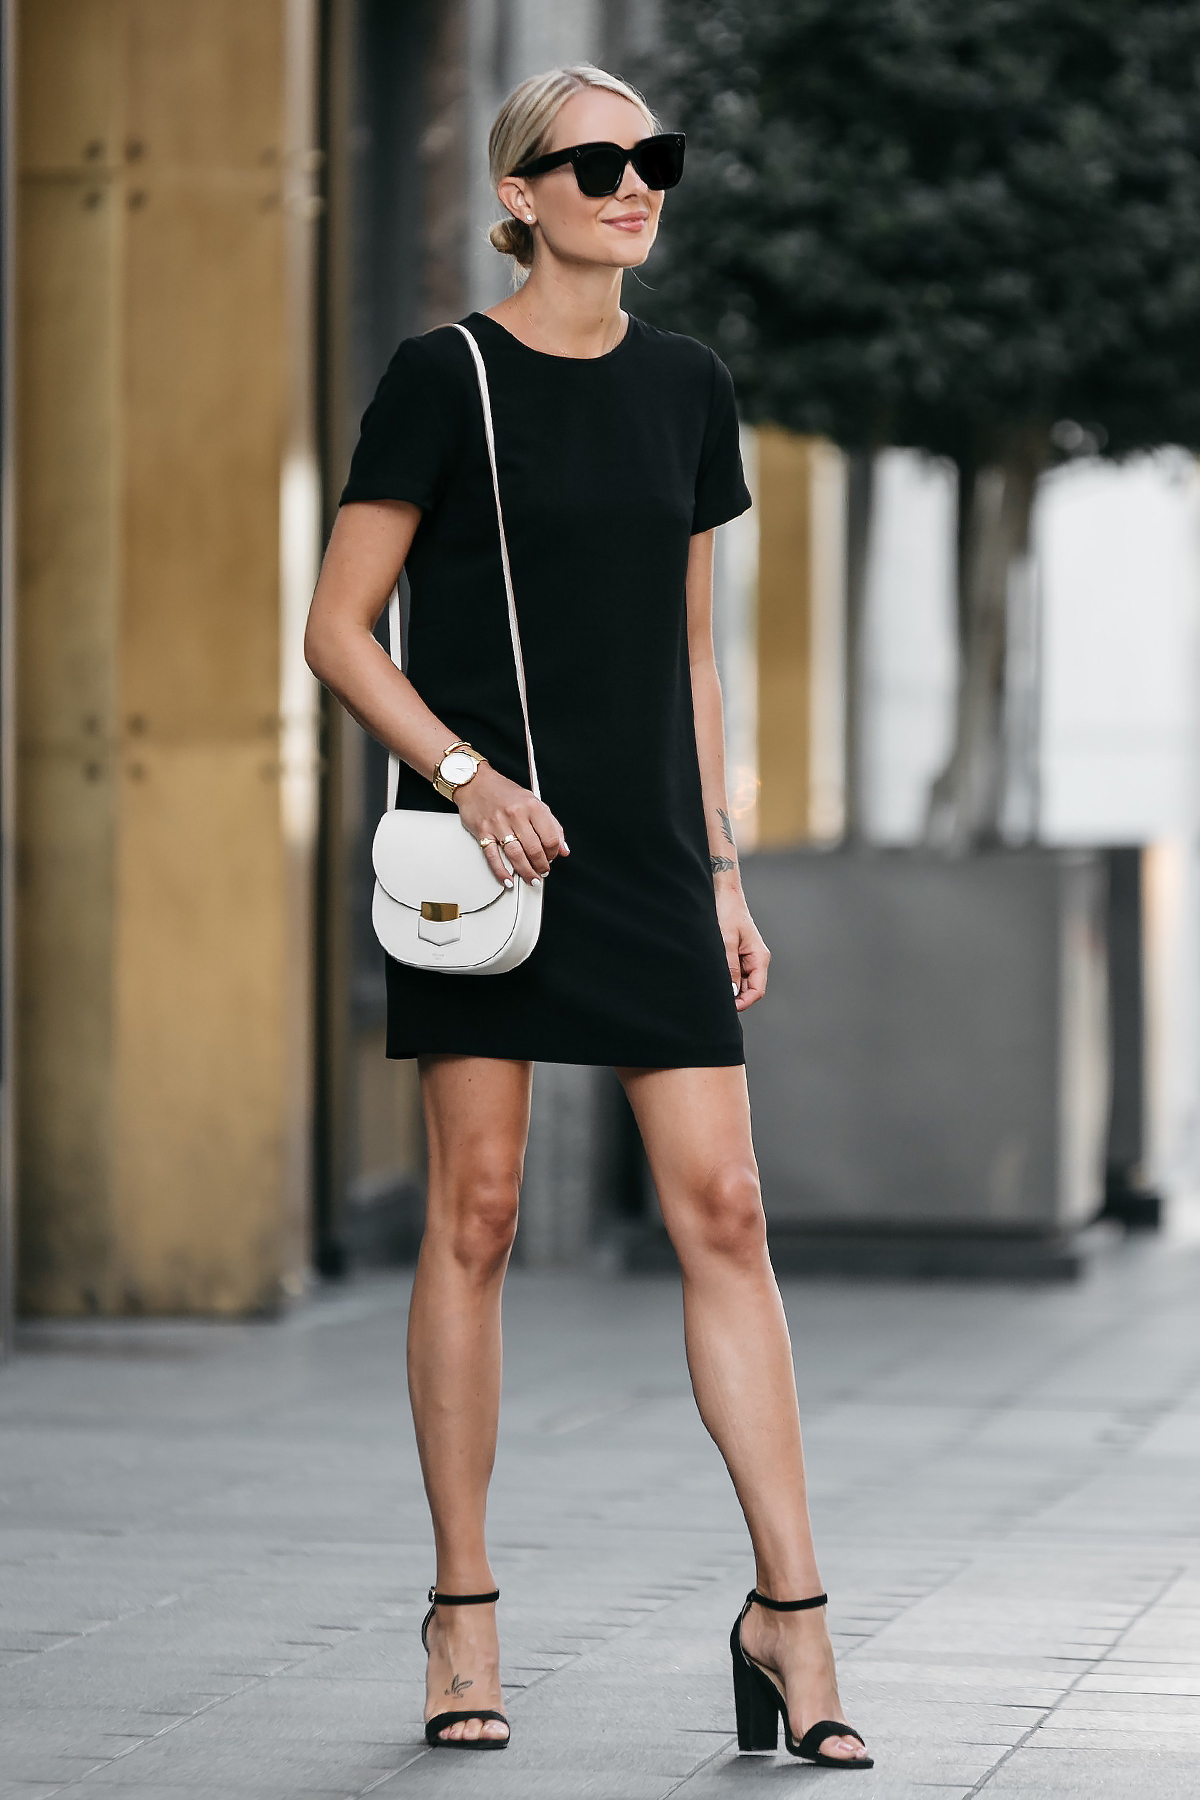 Blonde Wearing Nordstrom Black Shift Dress Outfit Black Ankle Strap Heeled Sandals Celine White Trotteur Handbag Fashion Jackson Dallas Blogger Fashion Blogger Street Style